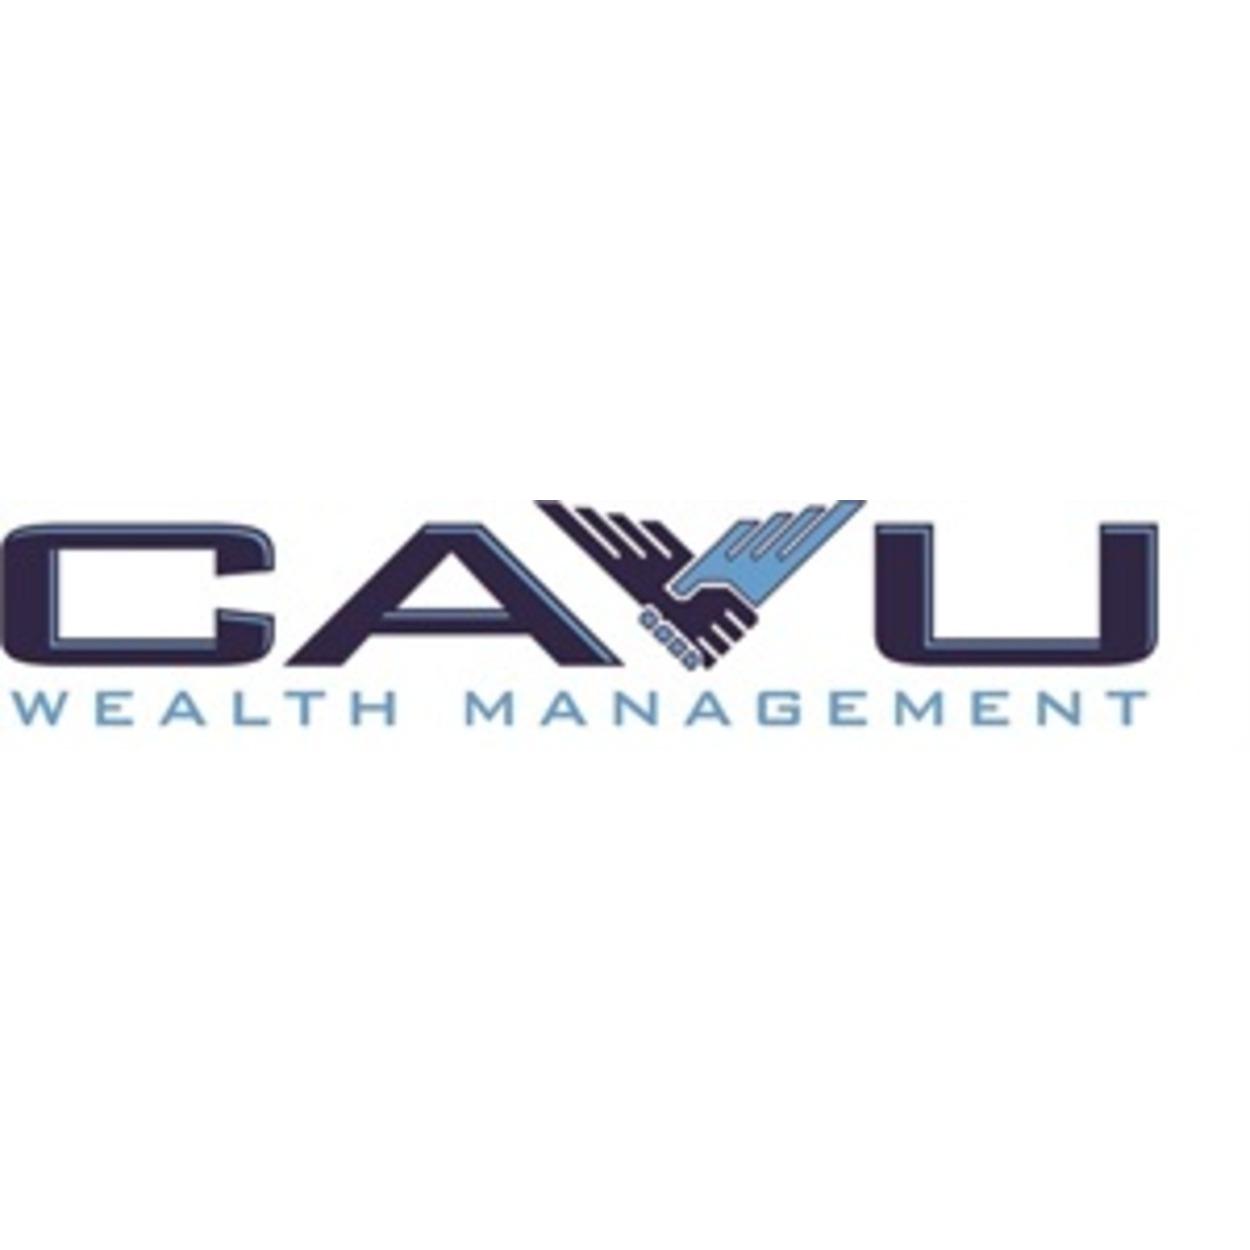 Cavu Wealth Managment